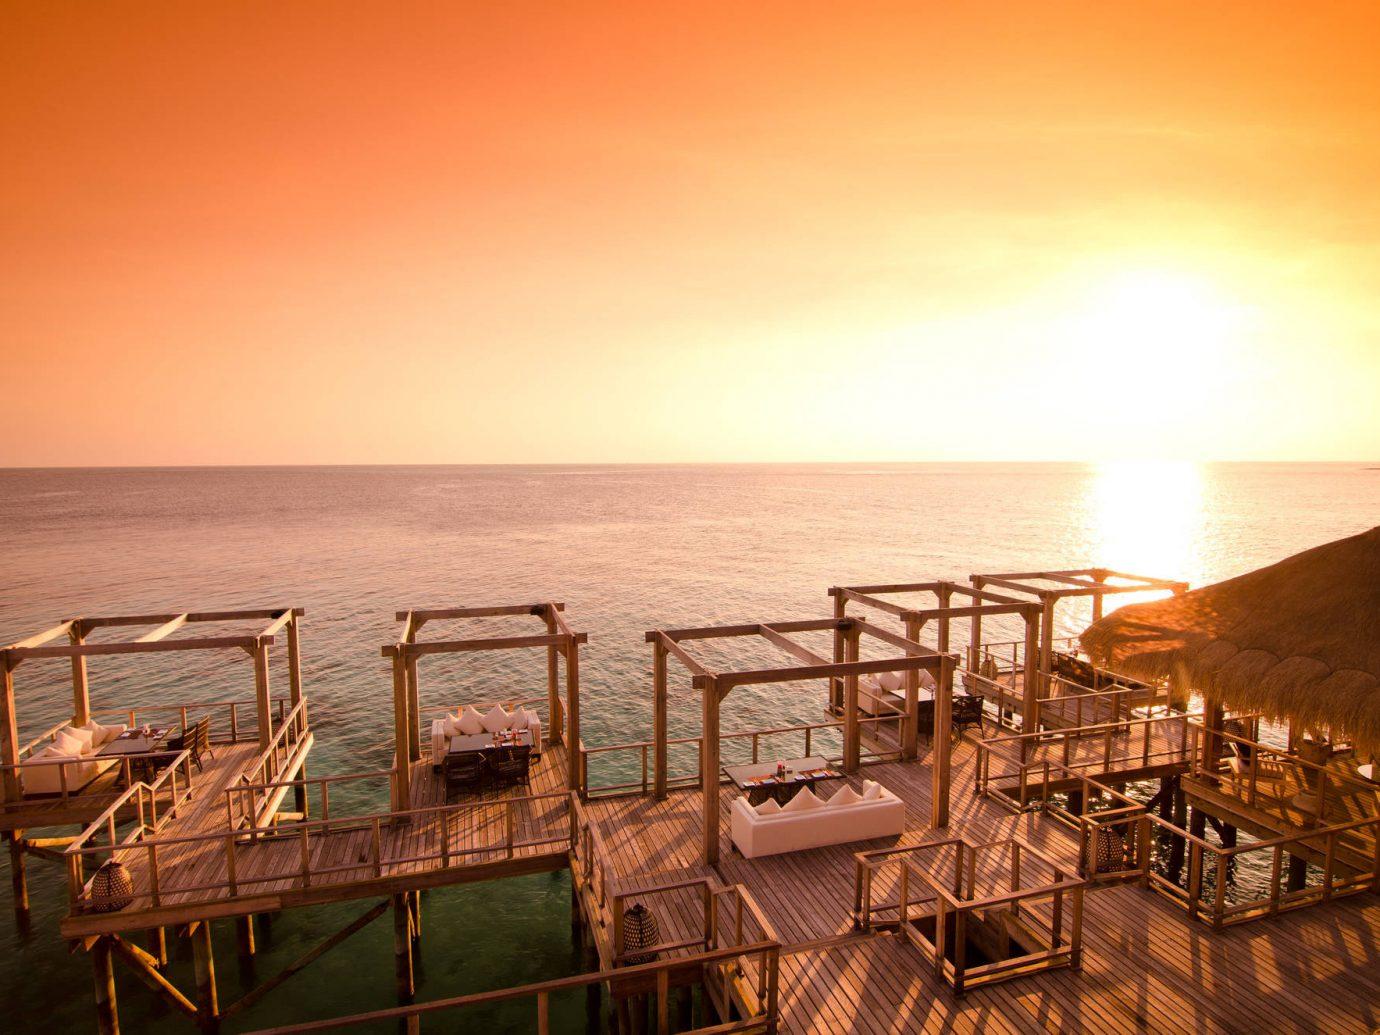 Hotels sky outdoor water Sunset Sea evening morning Ocean dusk sunrise set several